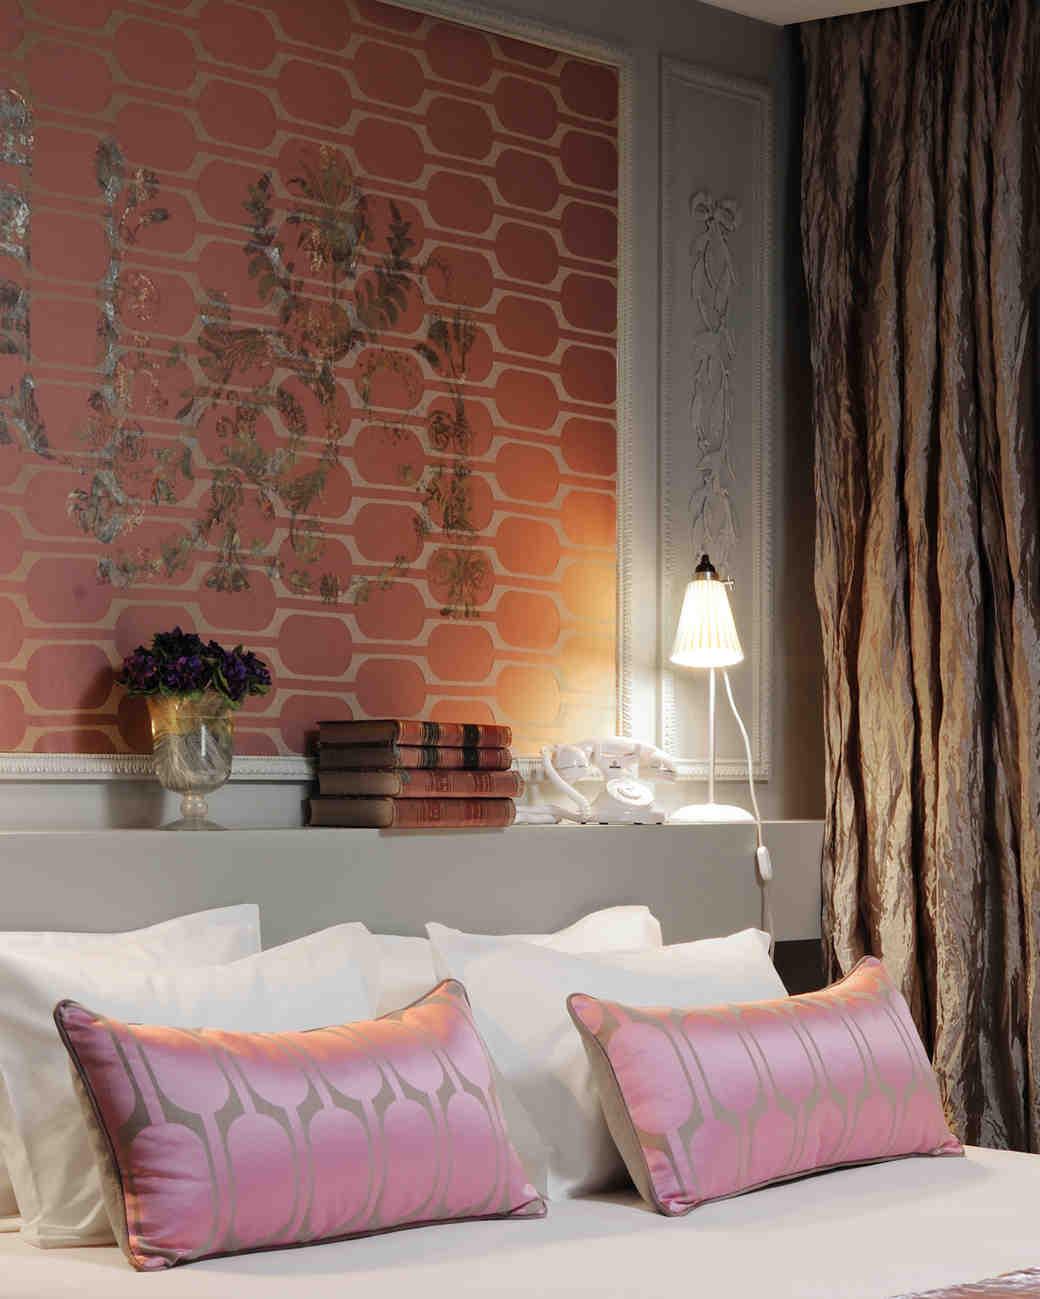 mrmrssmith-romantic-proposals-paris-hotel-juliette-1014.jpg